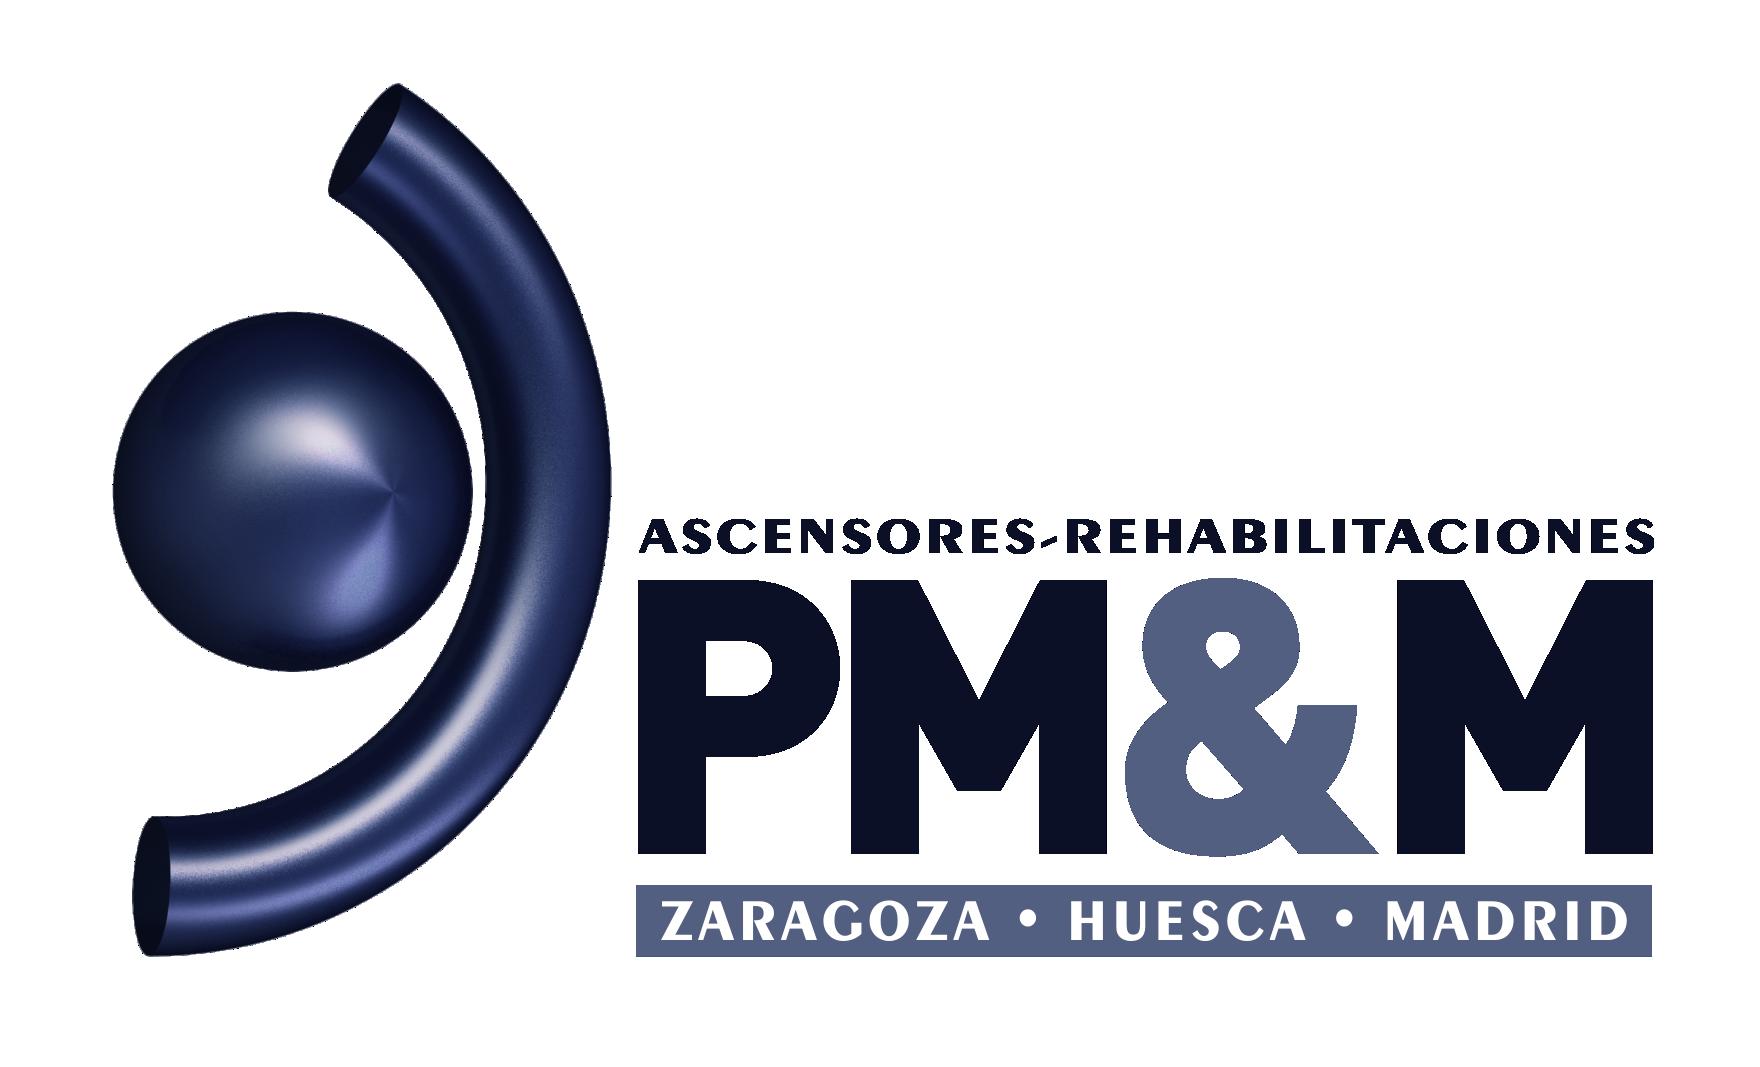 Ascensores en Zaragoza